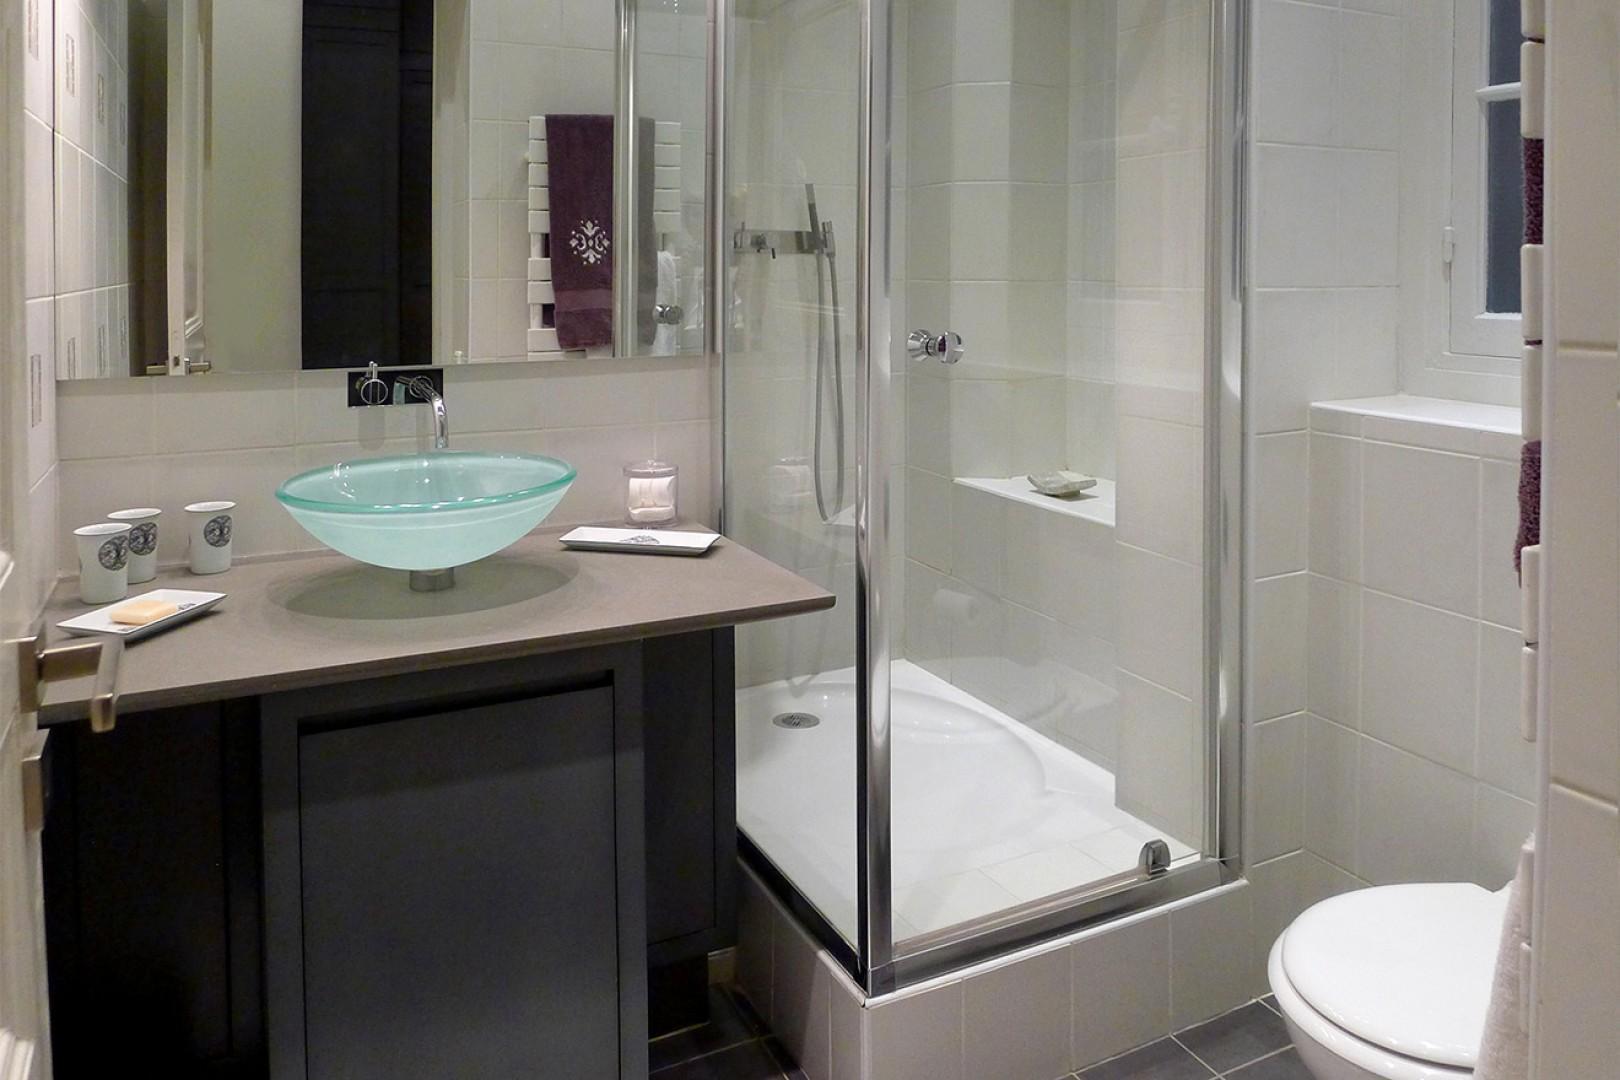 En suite bathroom 3 features a shower, toilet and sink.